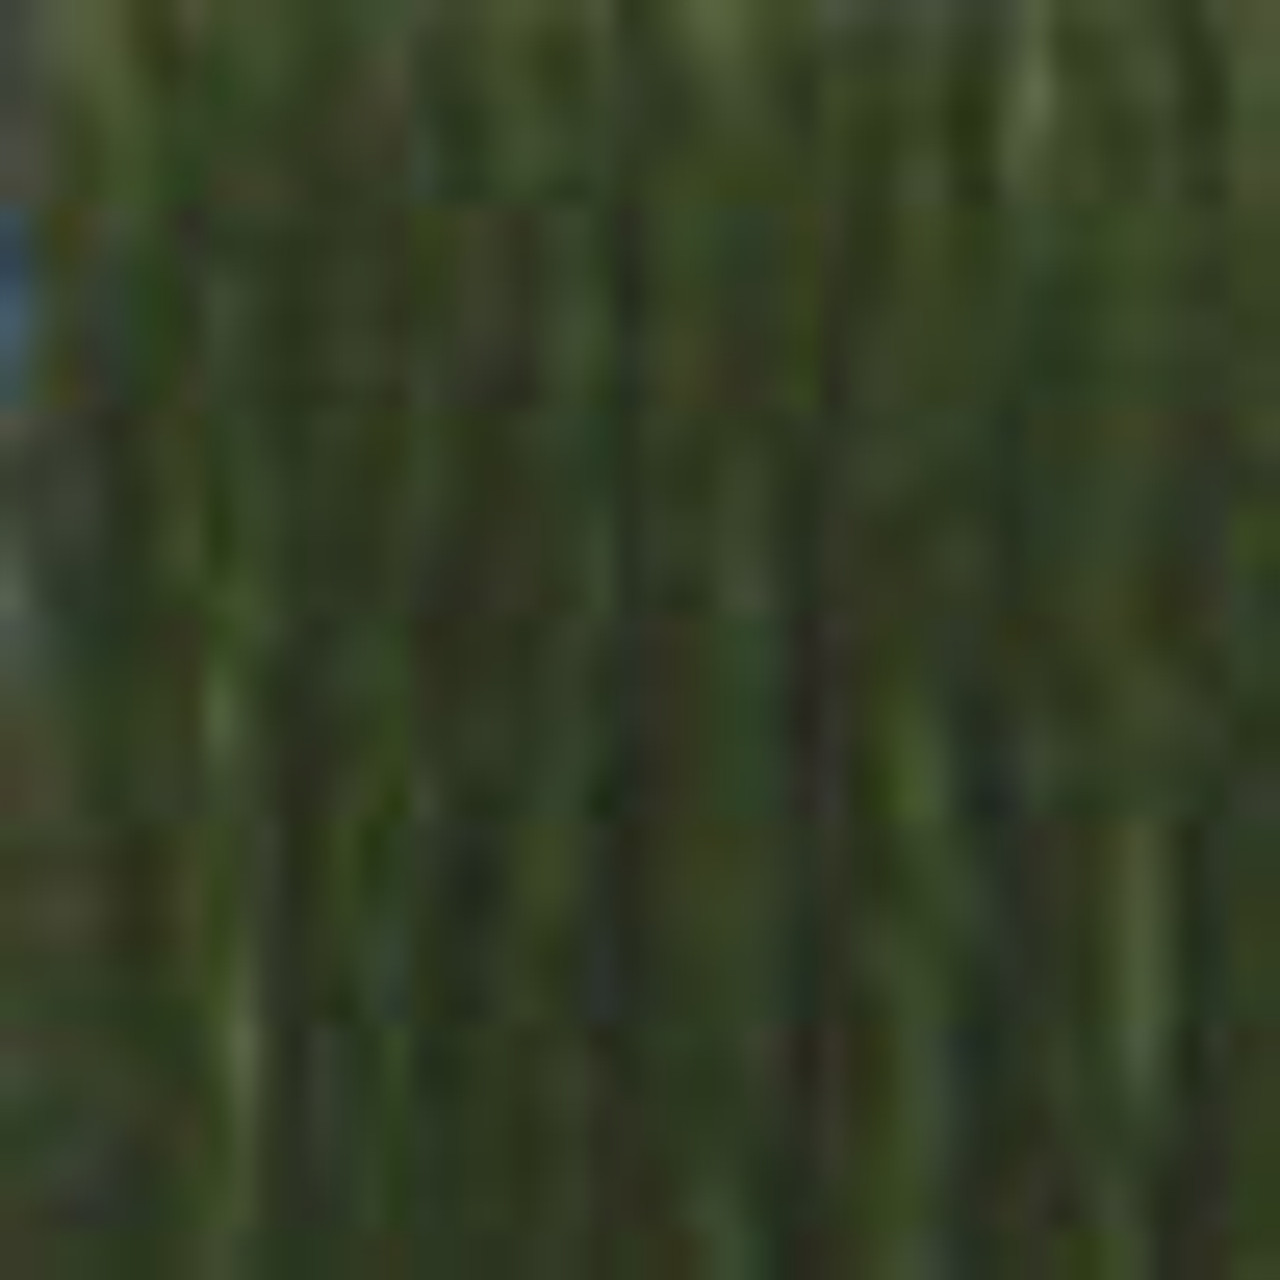 DMC # 934 Black Avocado Green Floss / Thread